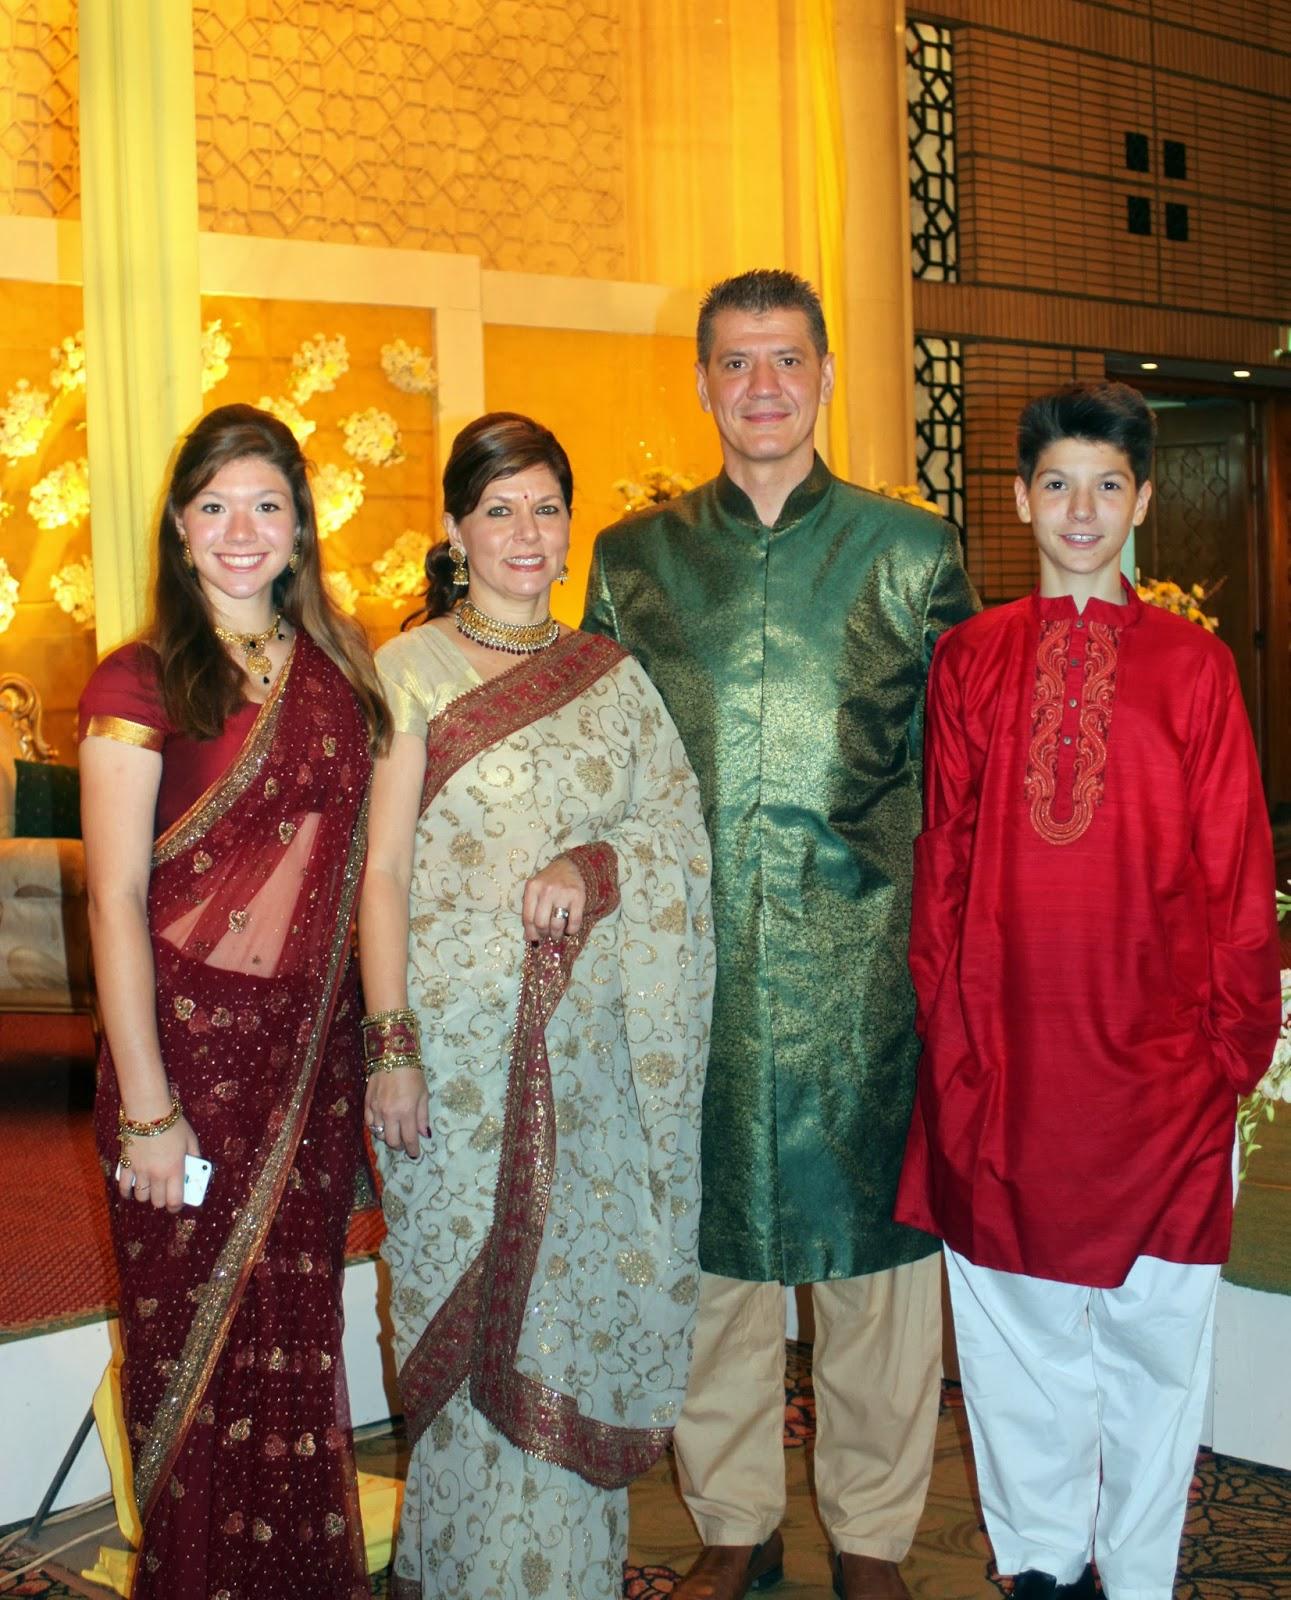 The Americans WILL Come: A Bangladeshi Wedding